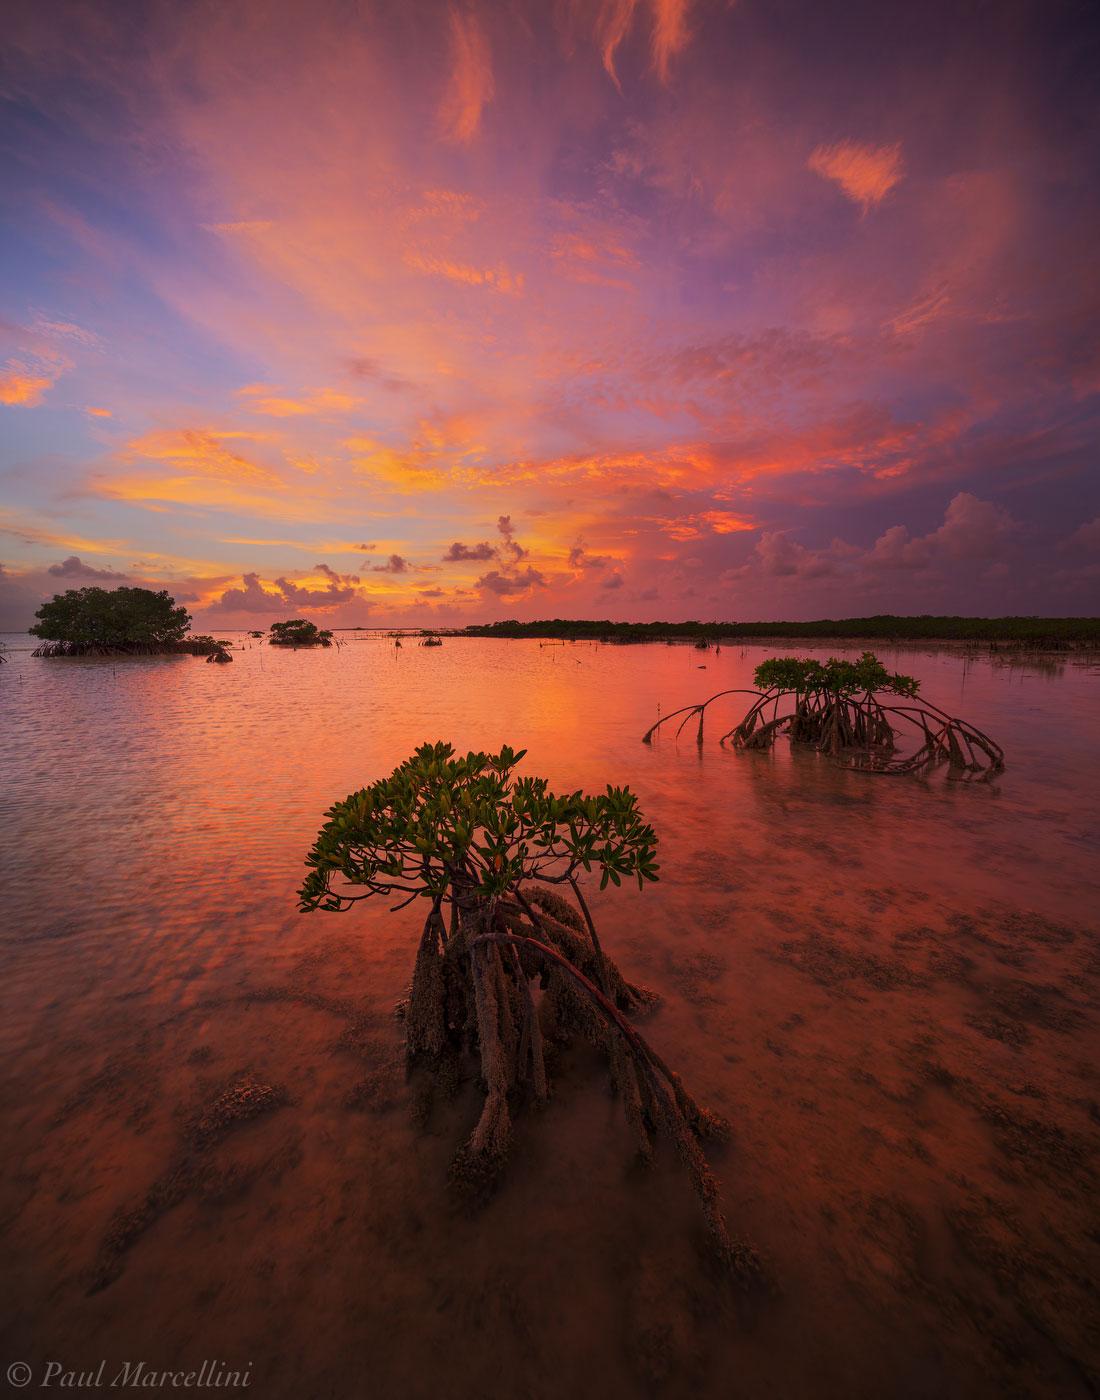 Sugarloaf Key, National Key Deer Refuge, Florida Keys, FL, red mangrove, keys, florida, south florida, nature, photography, photo